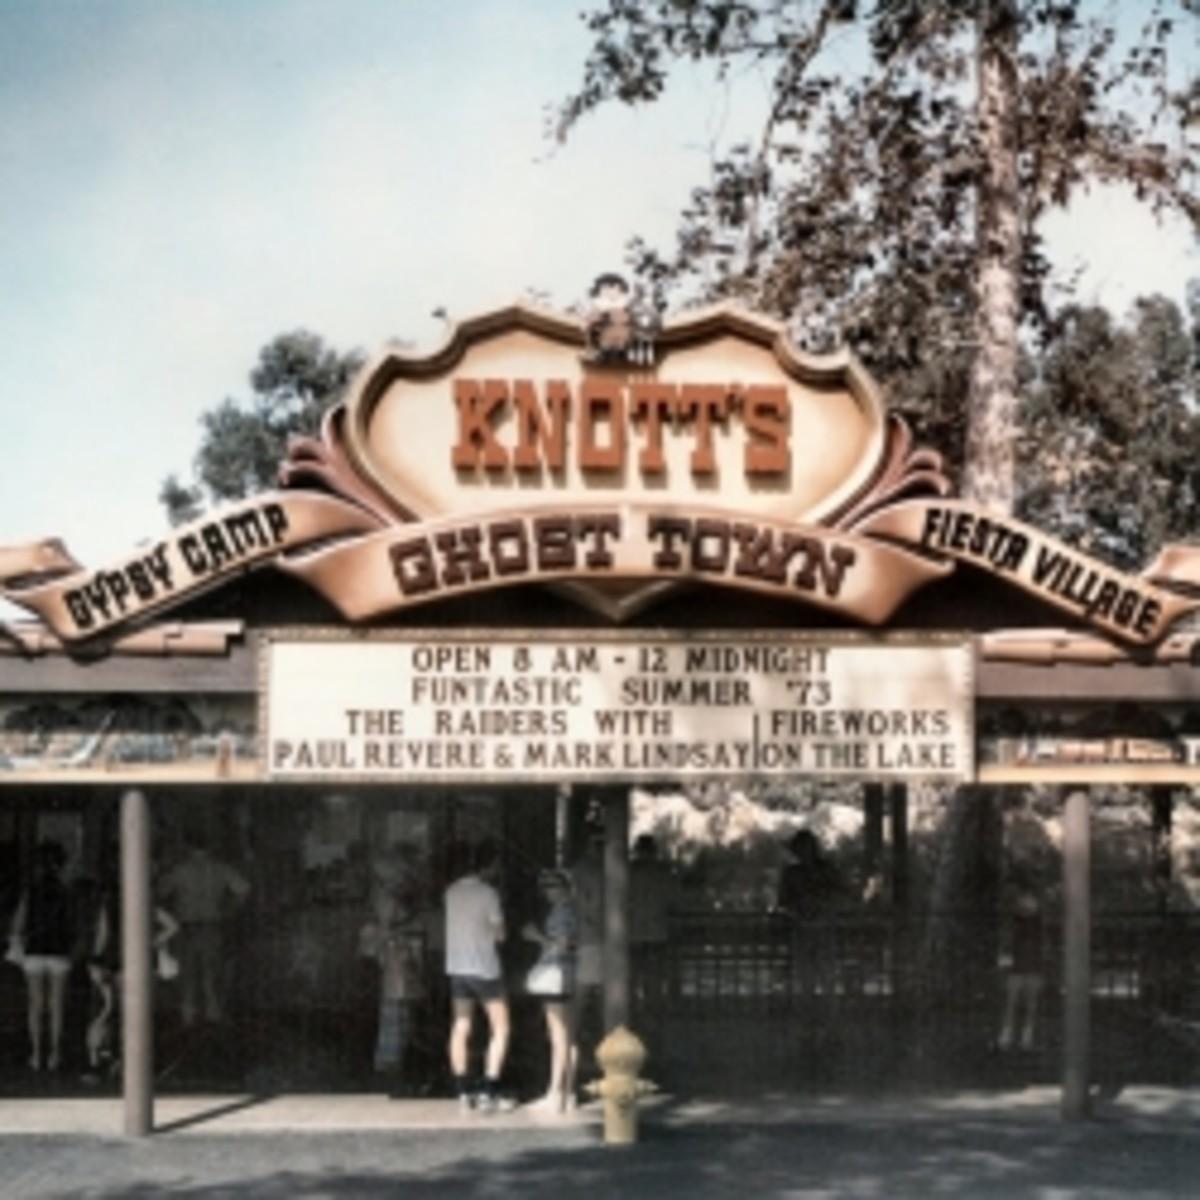 Knott's Berry Farm - A retrospective